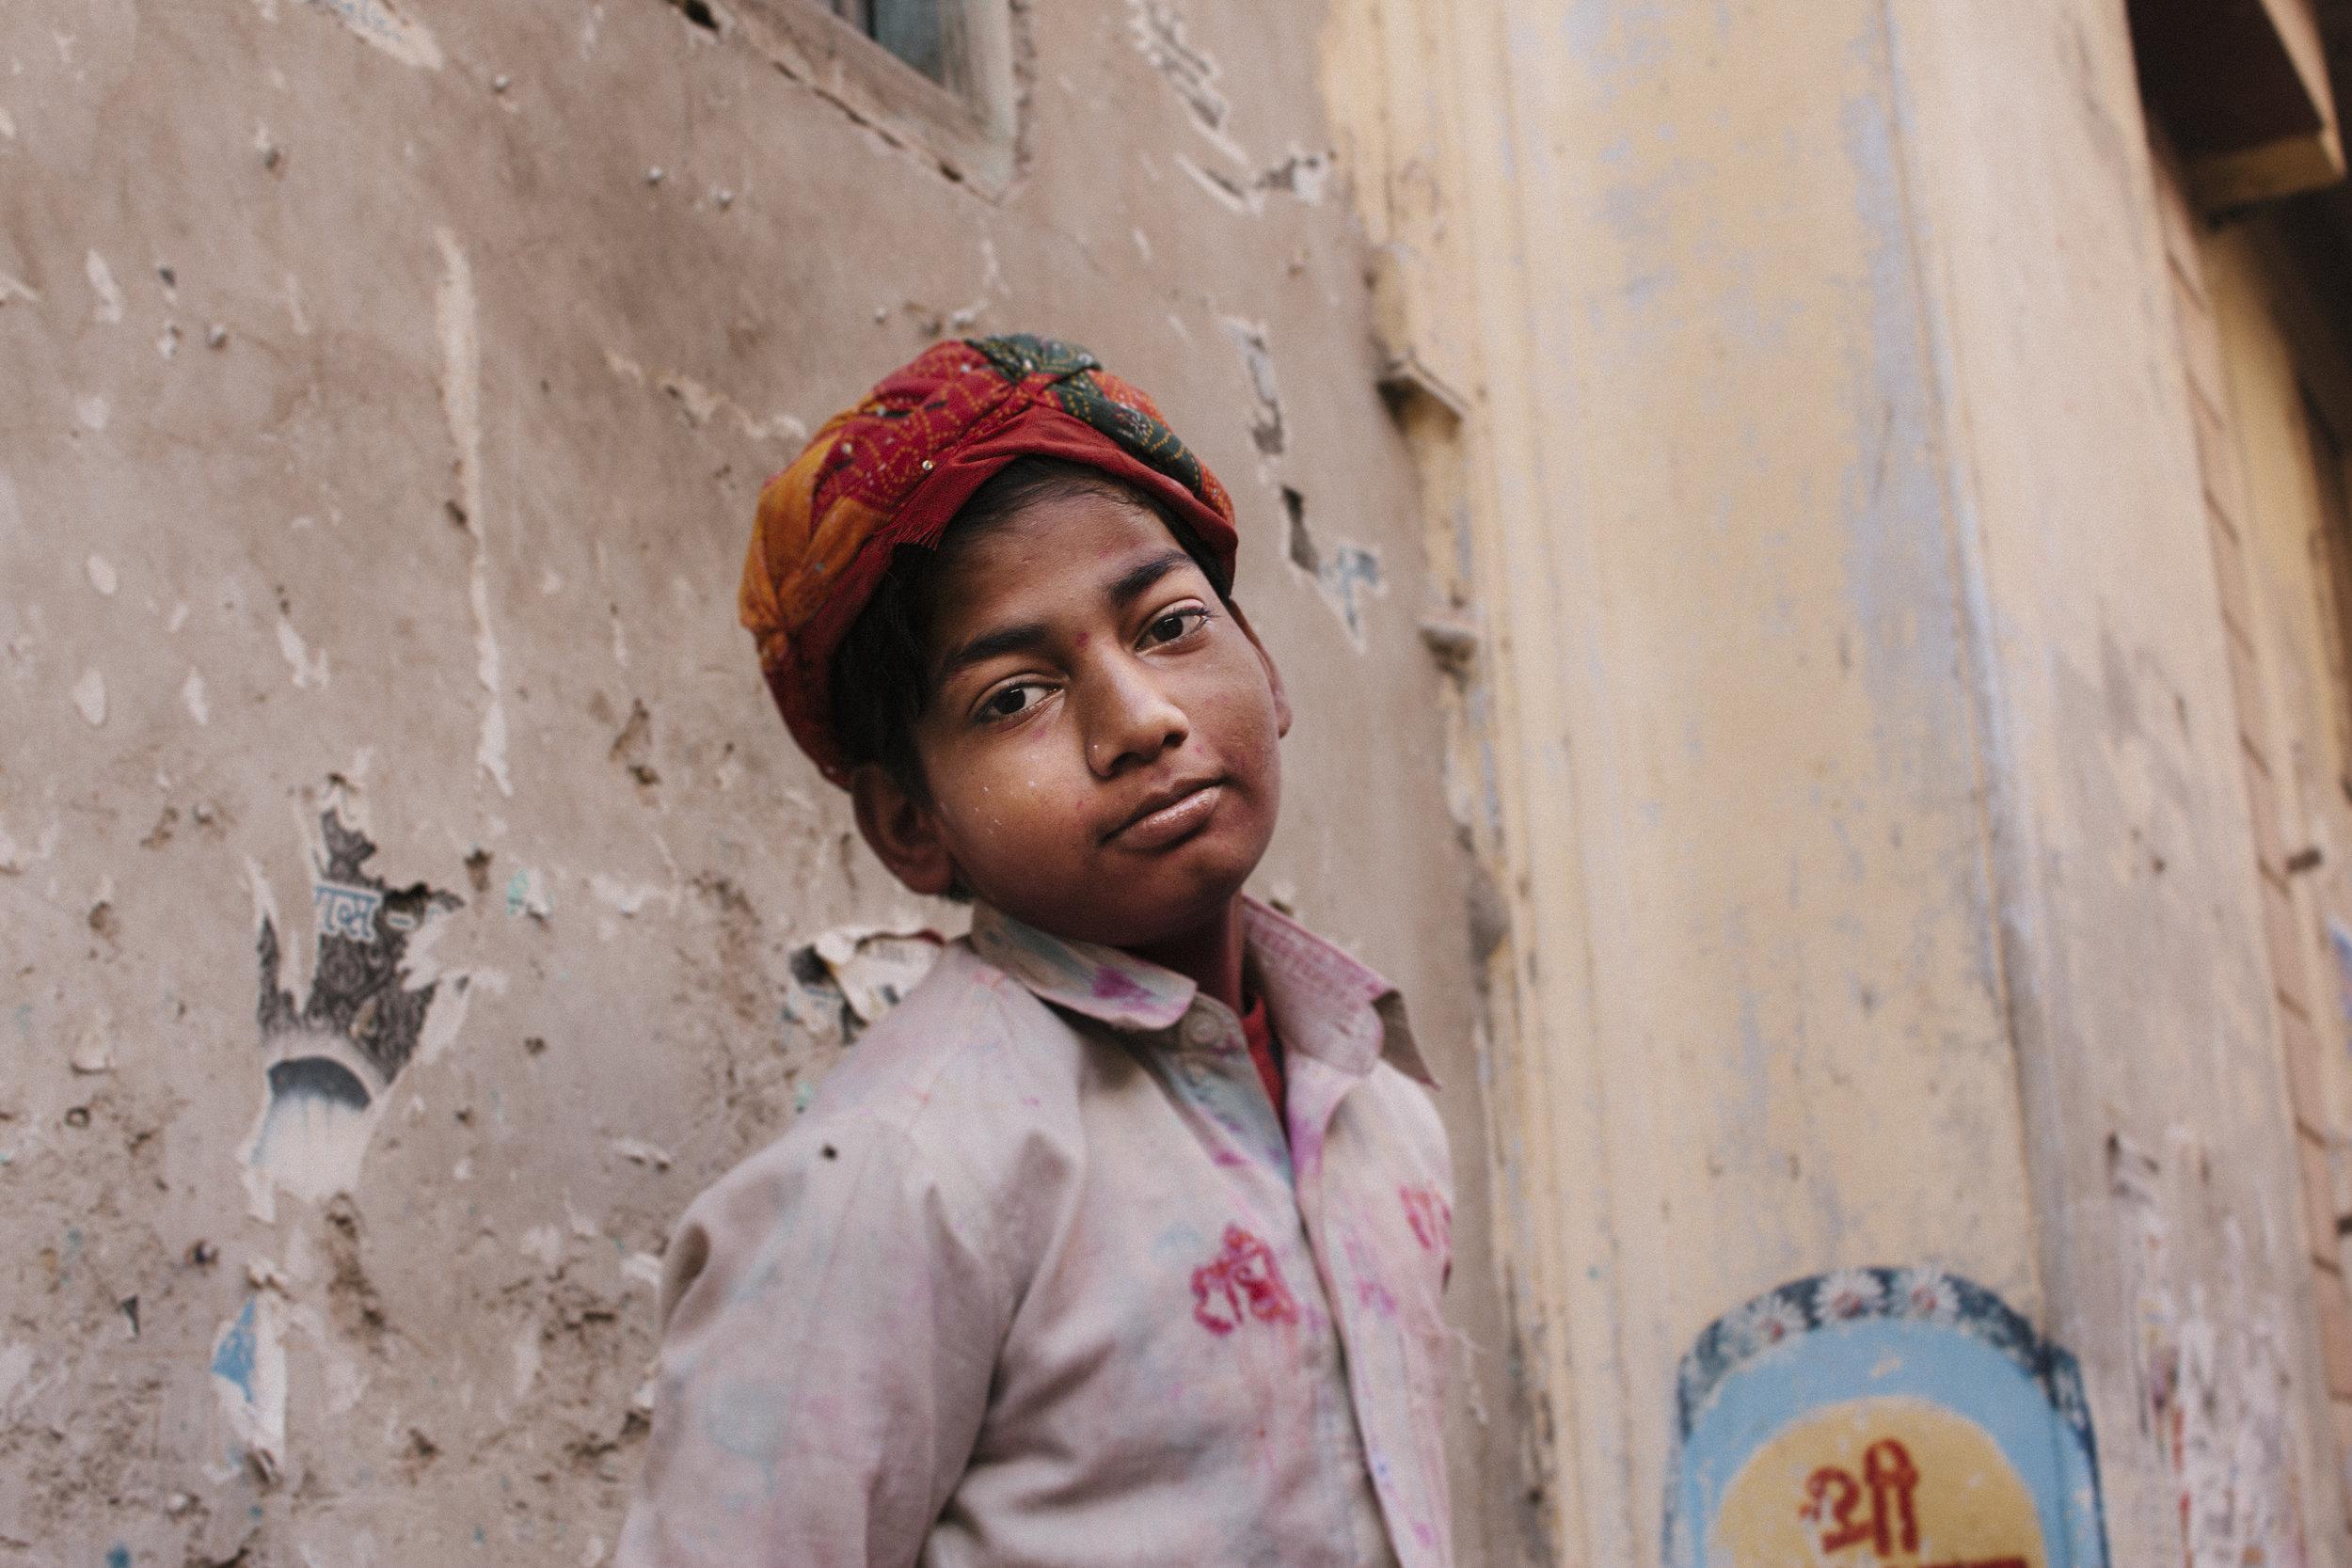 india_afteredit-1492.jpg